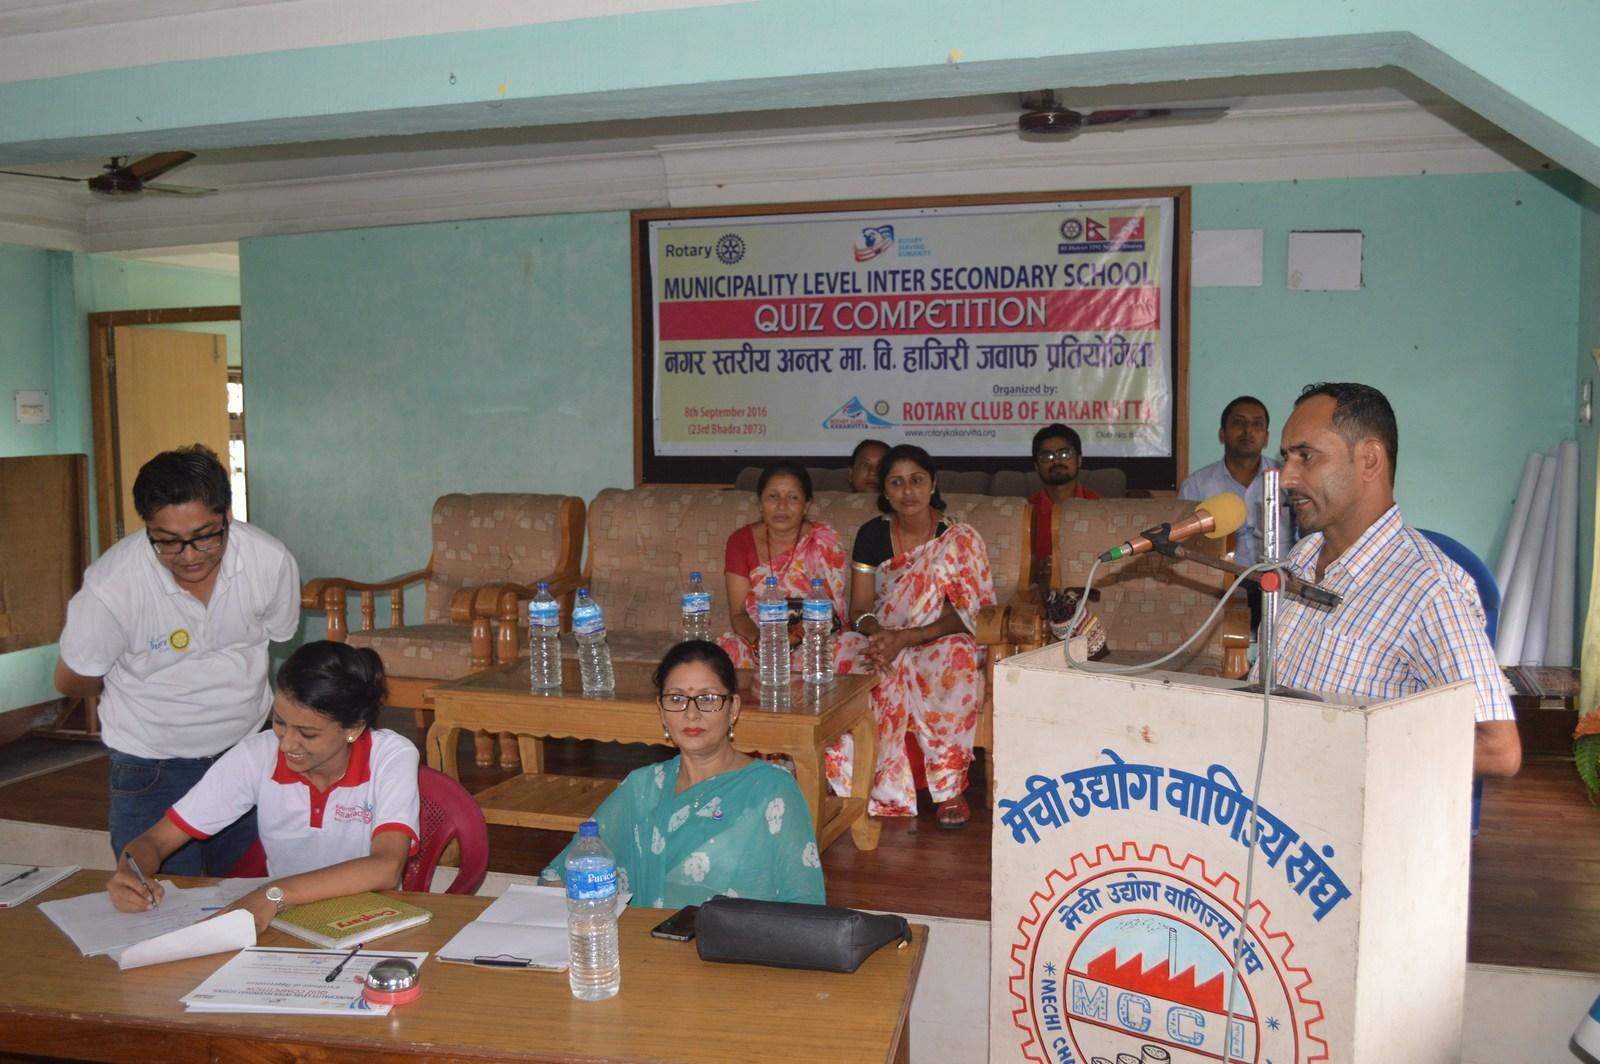 Municipality-Level-Inter-Secondary-School-Quiz-Contest-2016-Rotary-Club-of-Kakarvitta-40